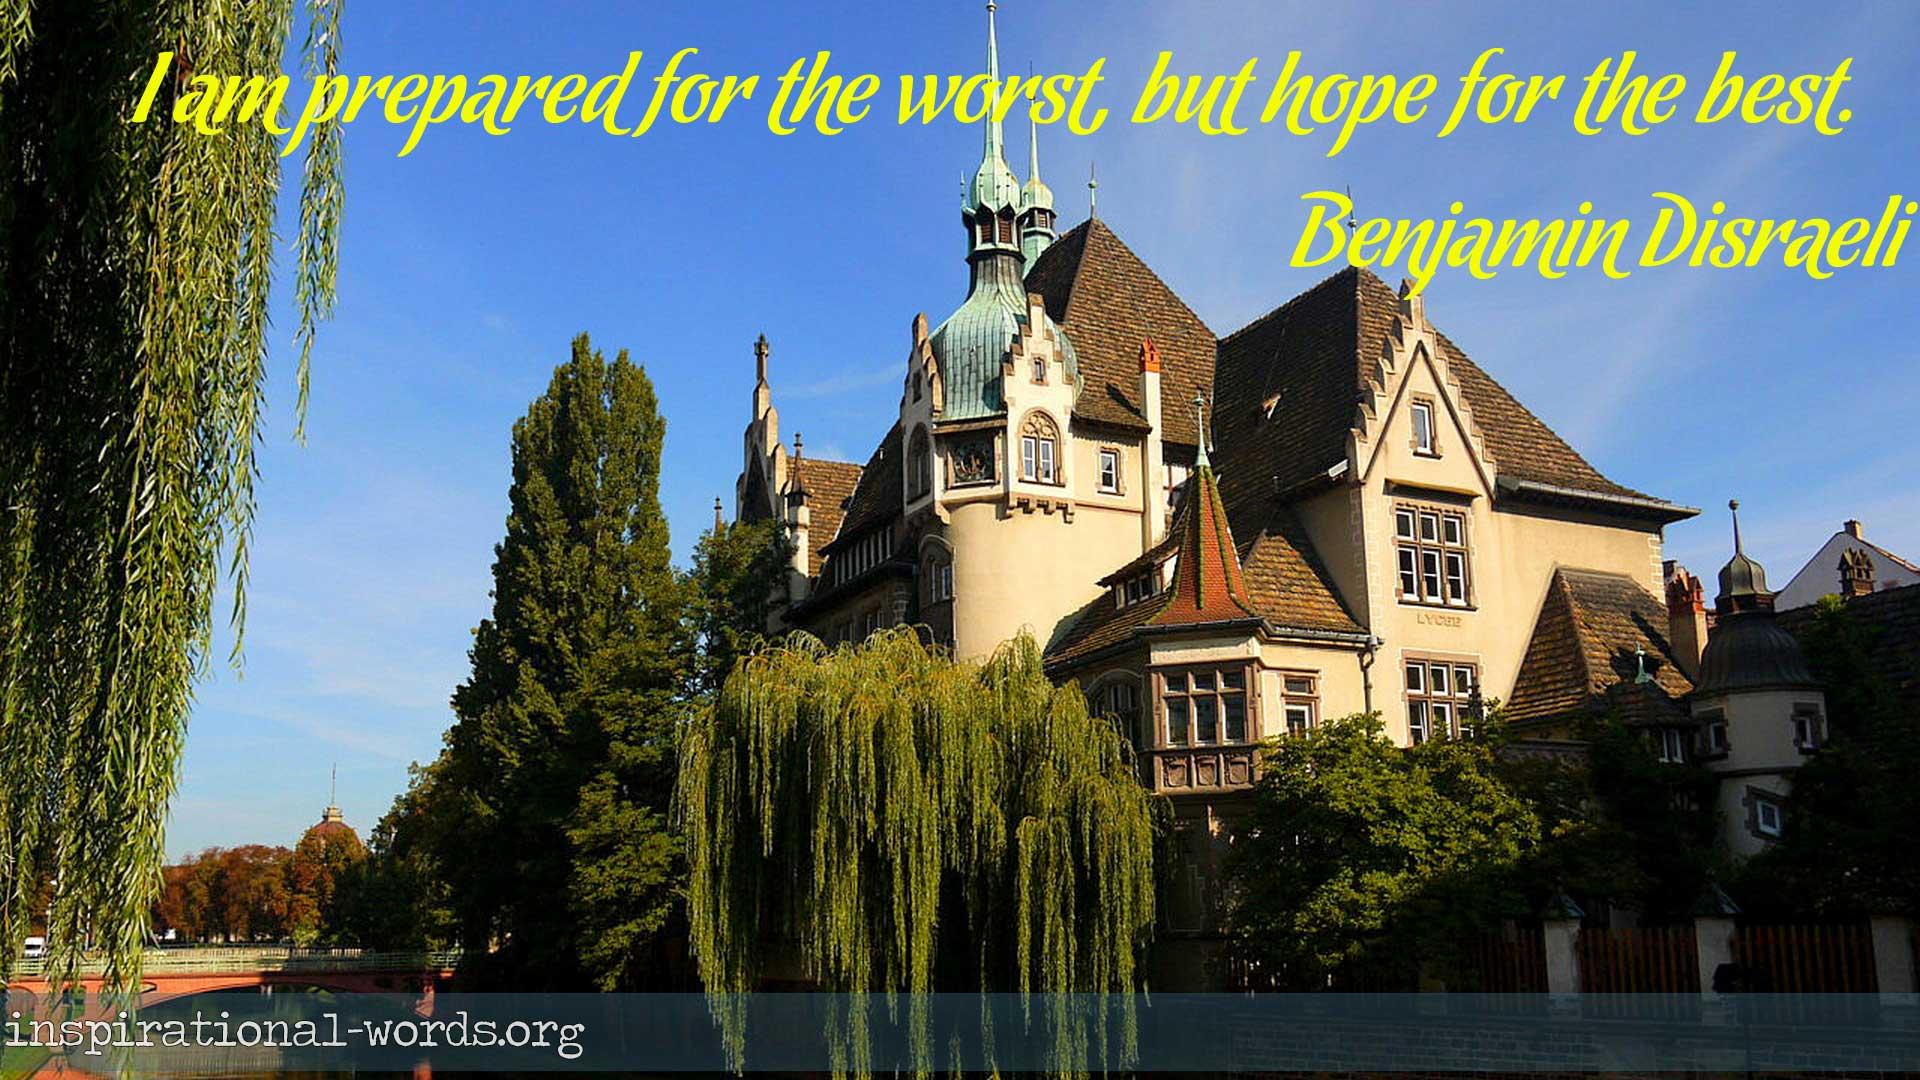 Inspirational Wallpaper Quote by Benjamin Disraeli